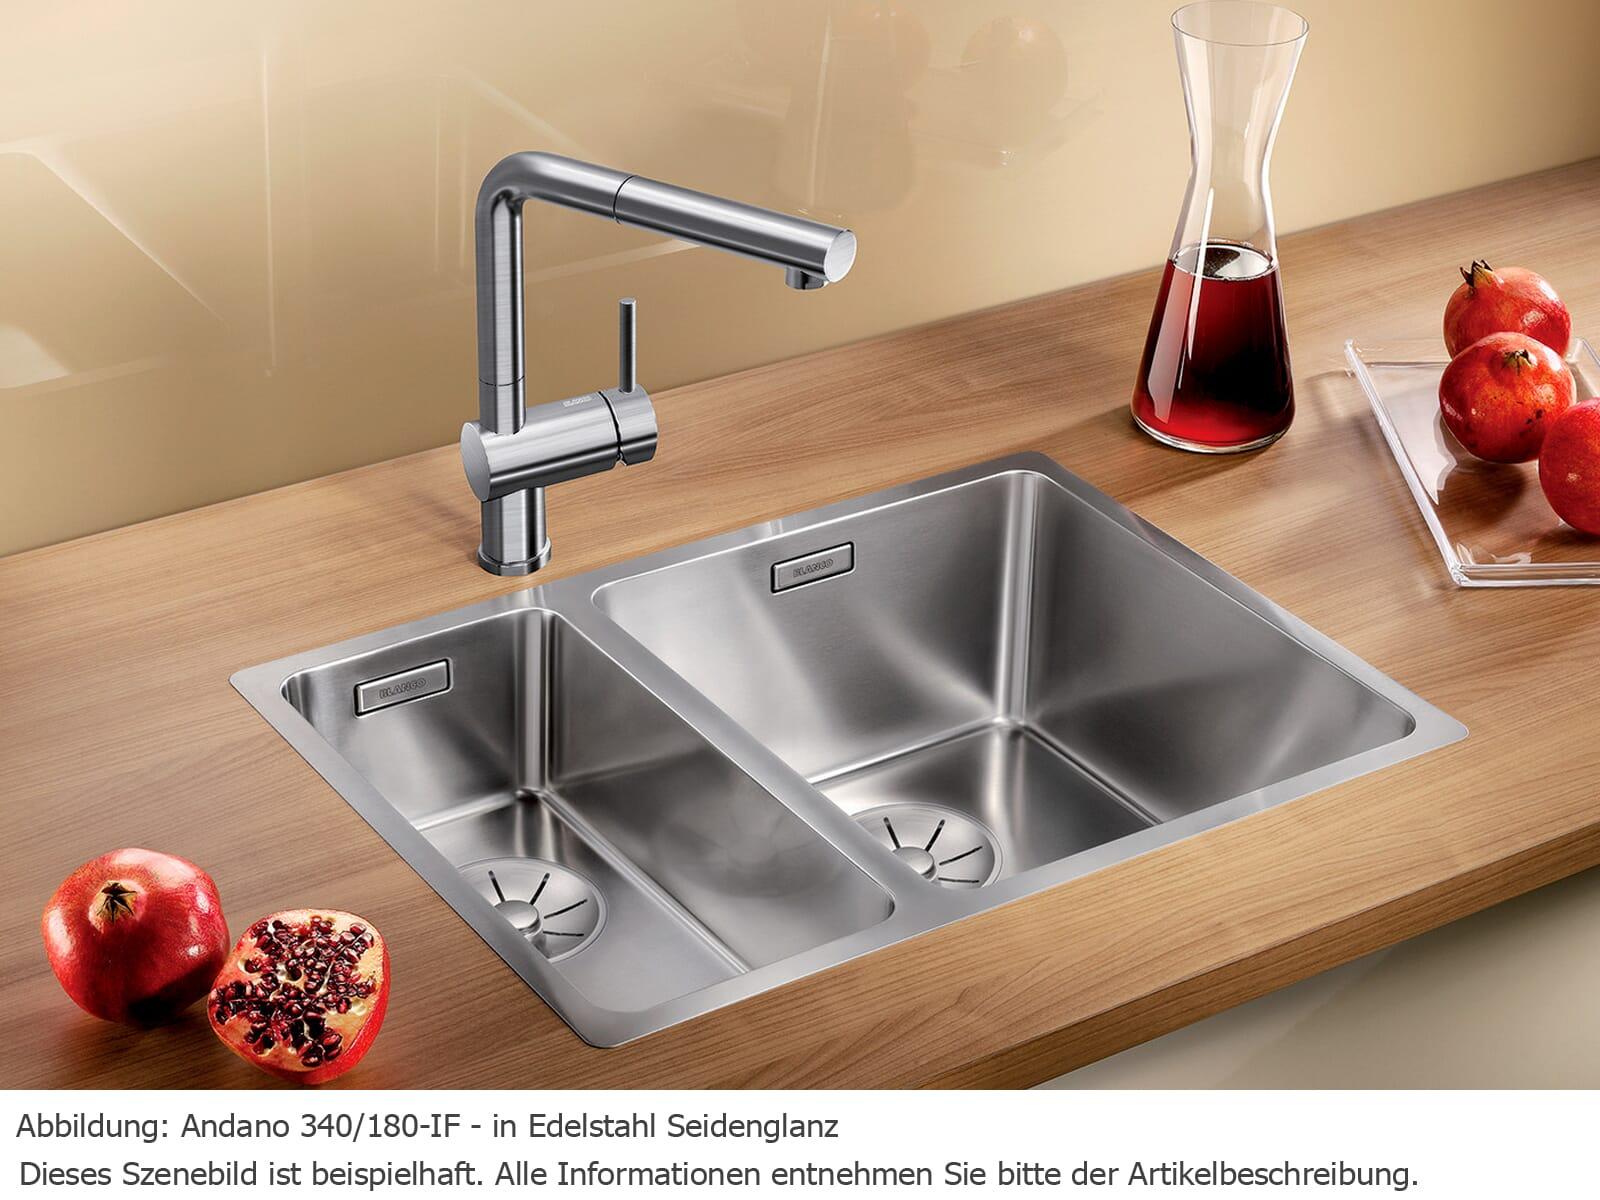 Blanco Andano 340/180-IF Edelstahlspüle Seidenglanz 522 973